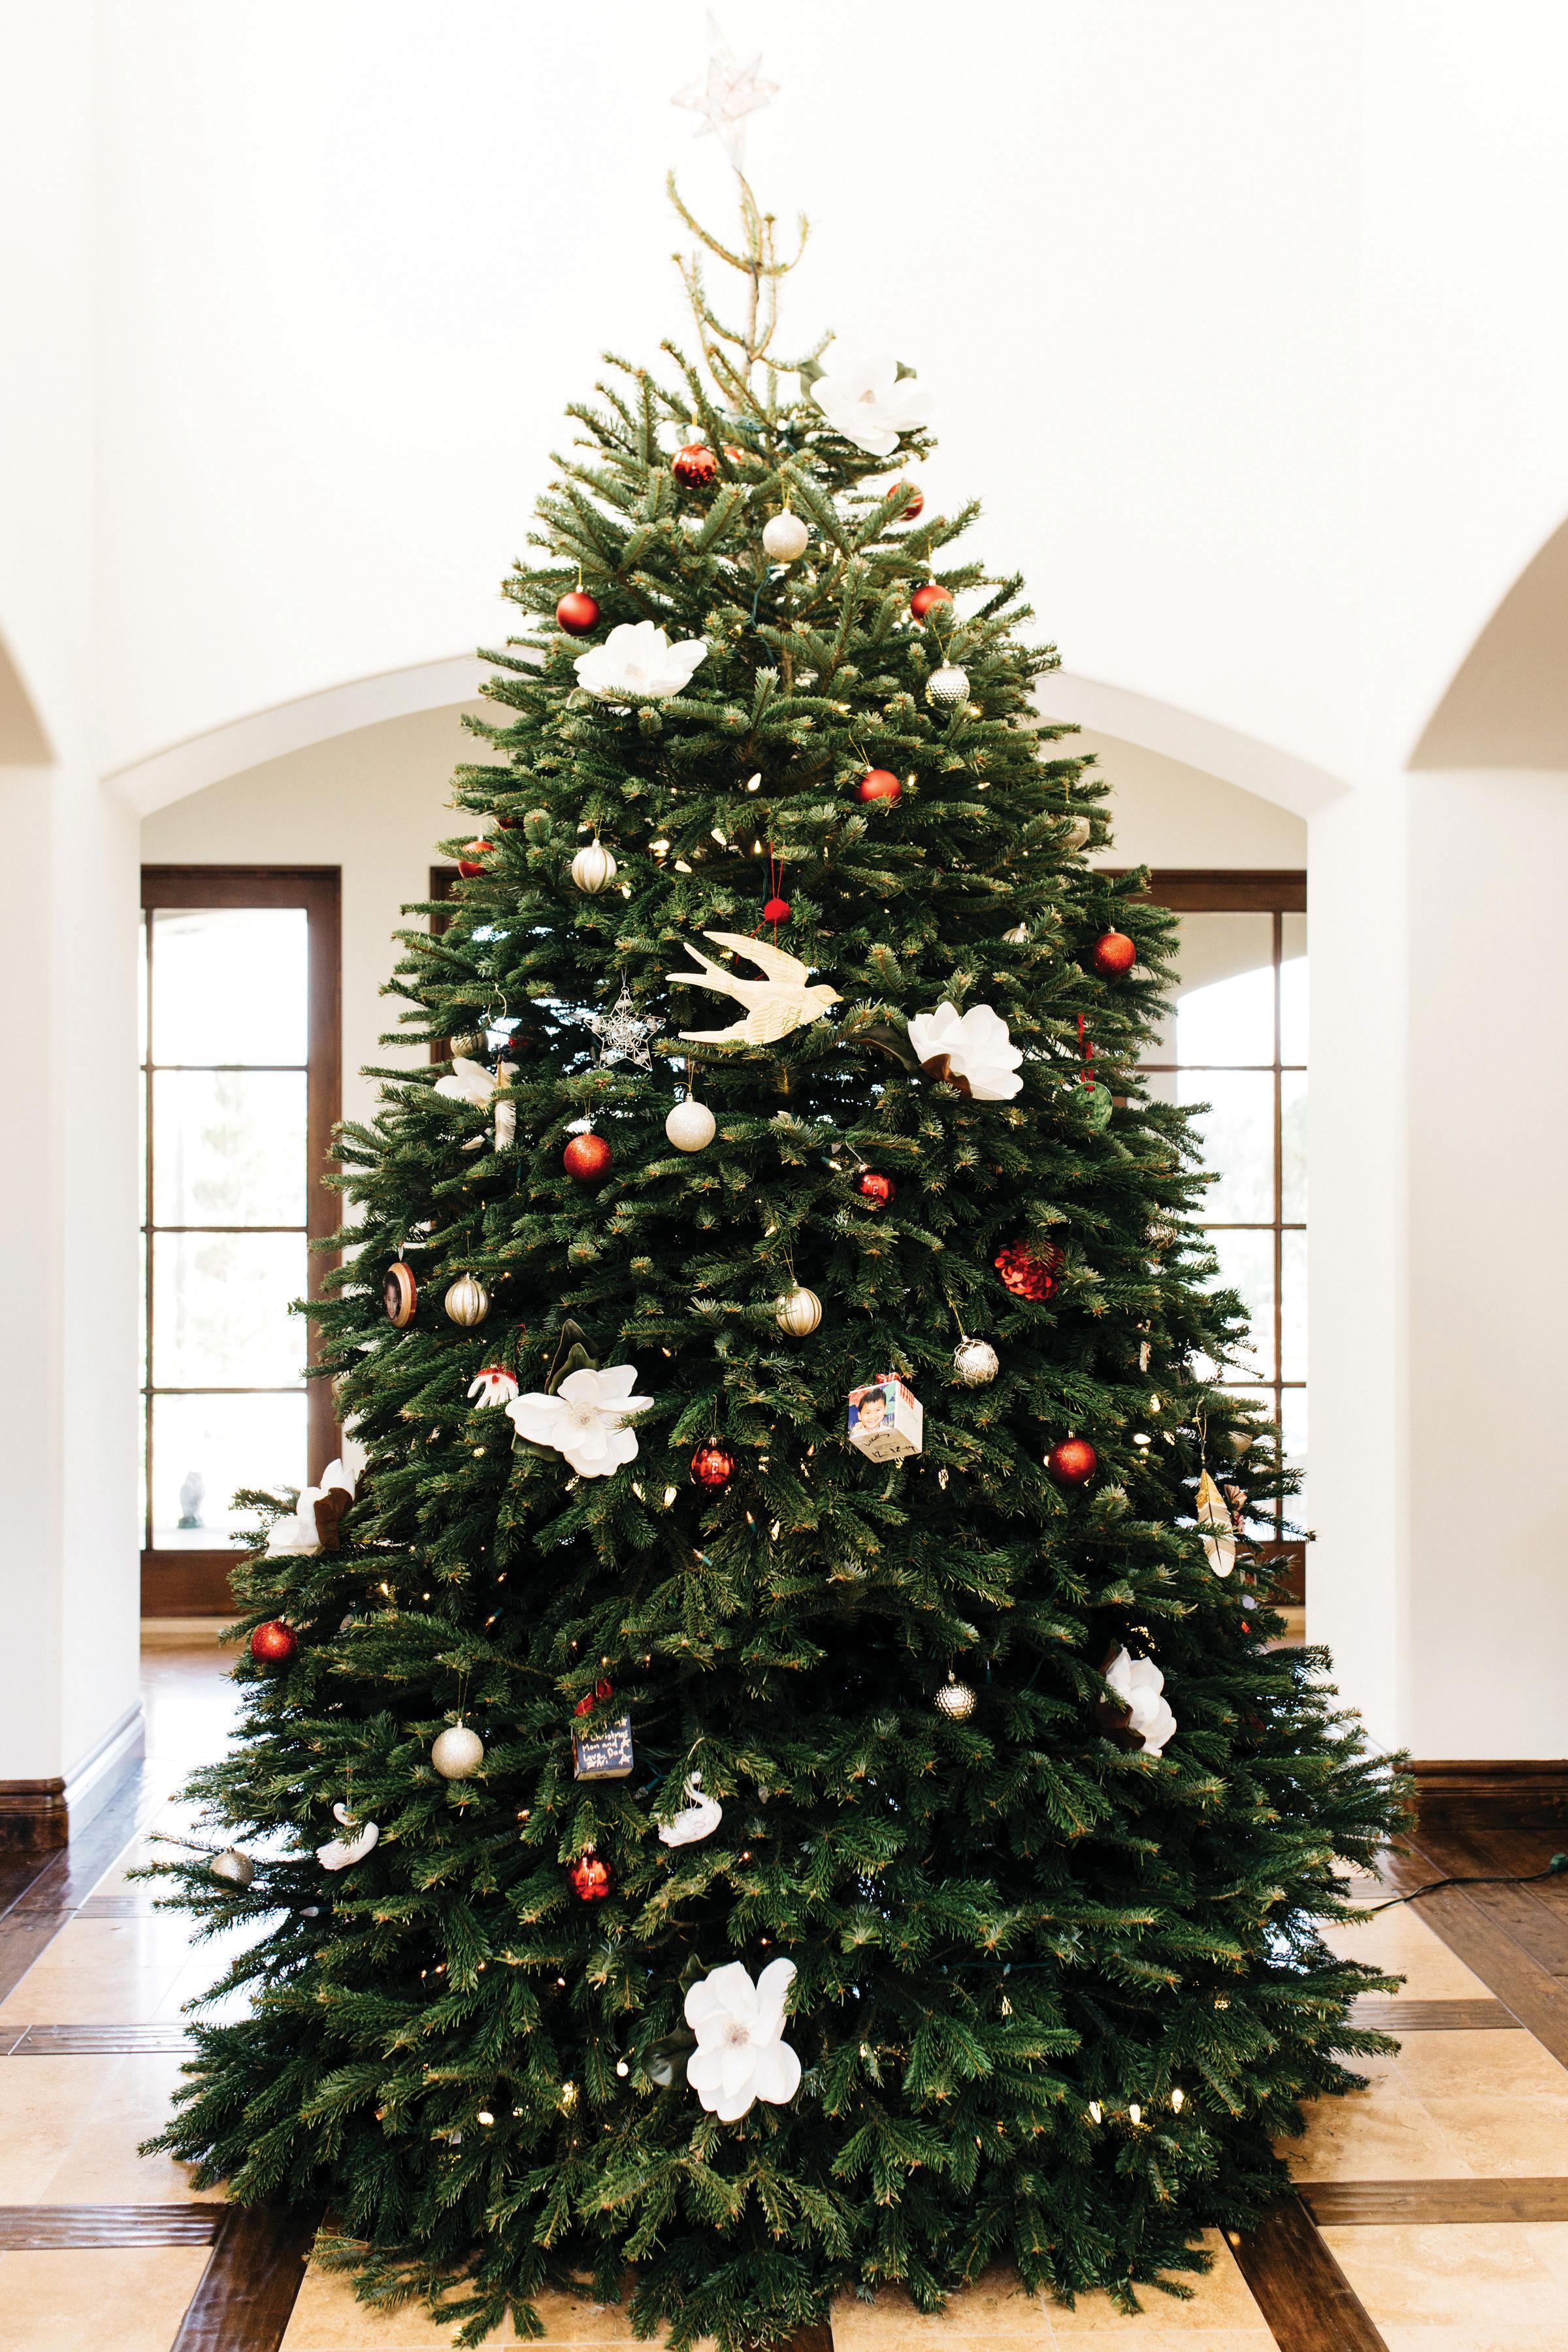 professional holiday decorating decorations decor interior designer seasonal christmas tree